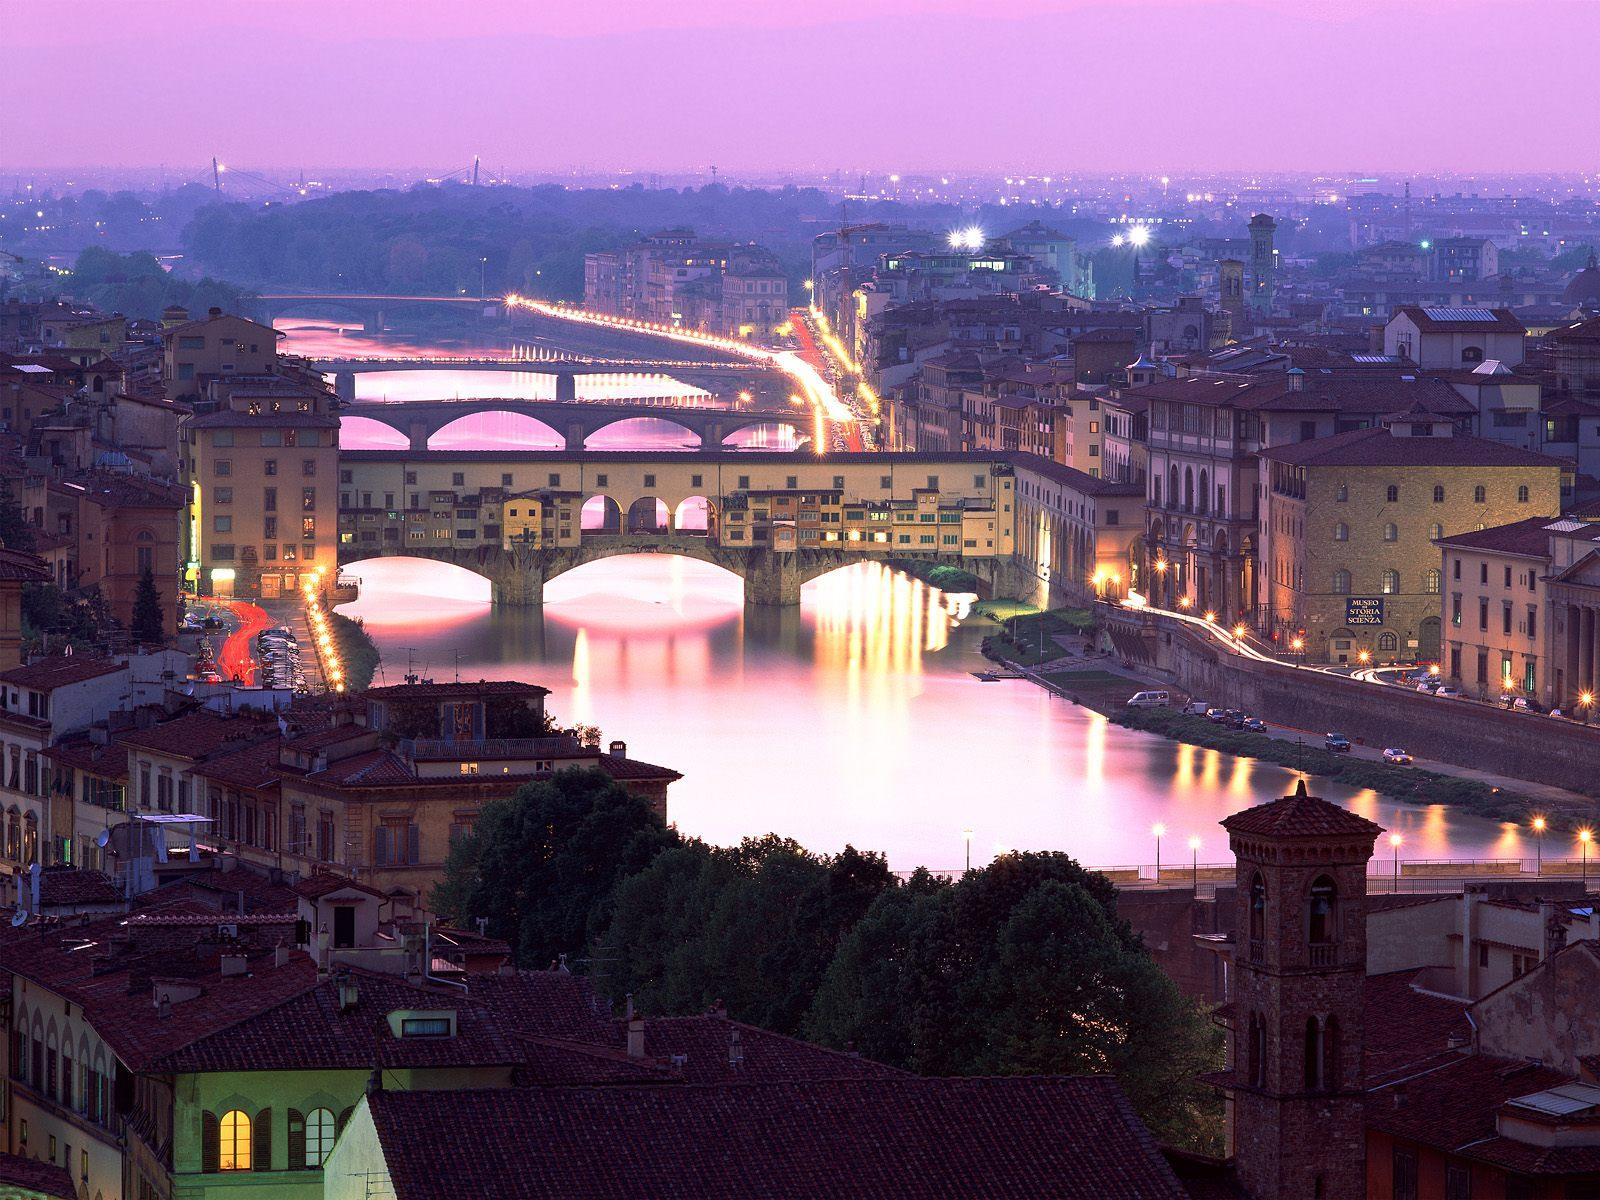 http://4.bp.blogspot.com/-conut3_o3AQ/Tcp4UptPs4I/AAAAAAAACXk/JX4yooq5aEQ/s1600/Ponte+Vecchio%252C+Florence%252C+Italy.jpg